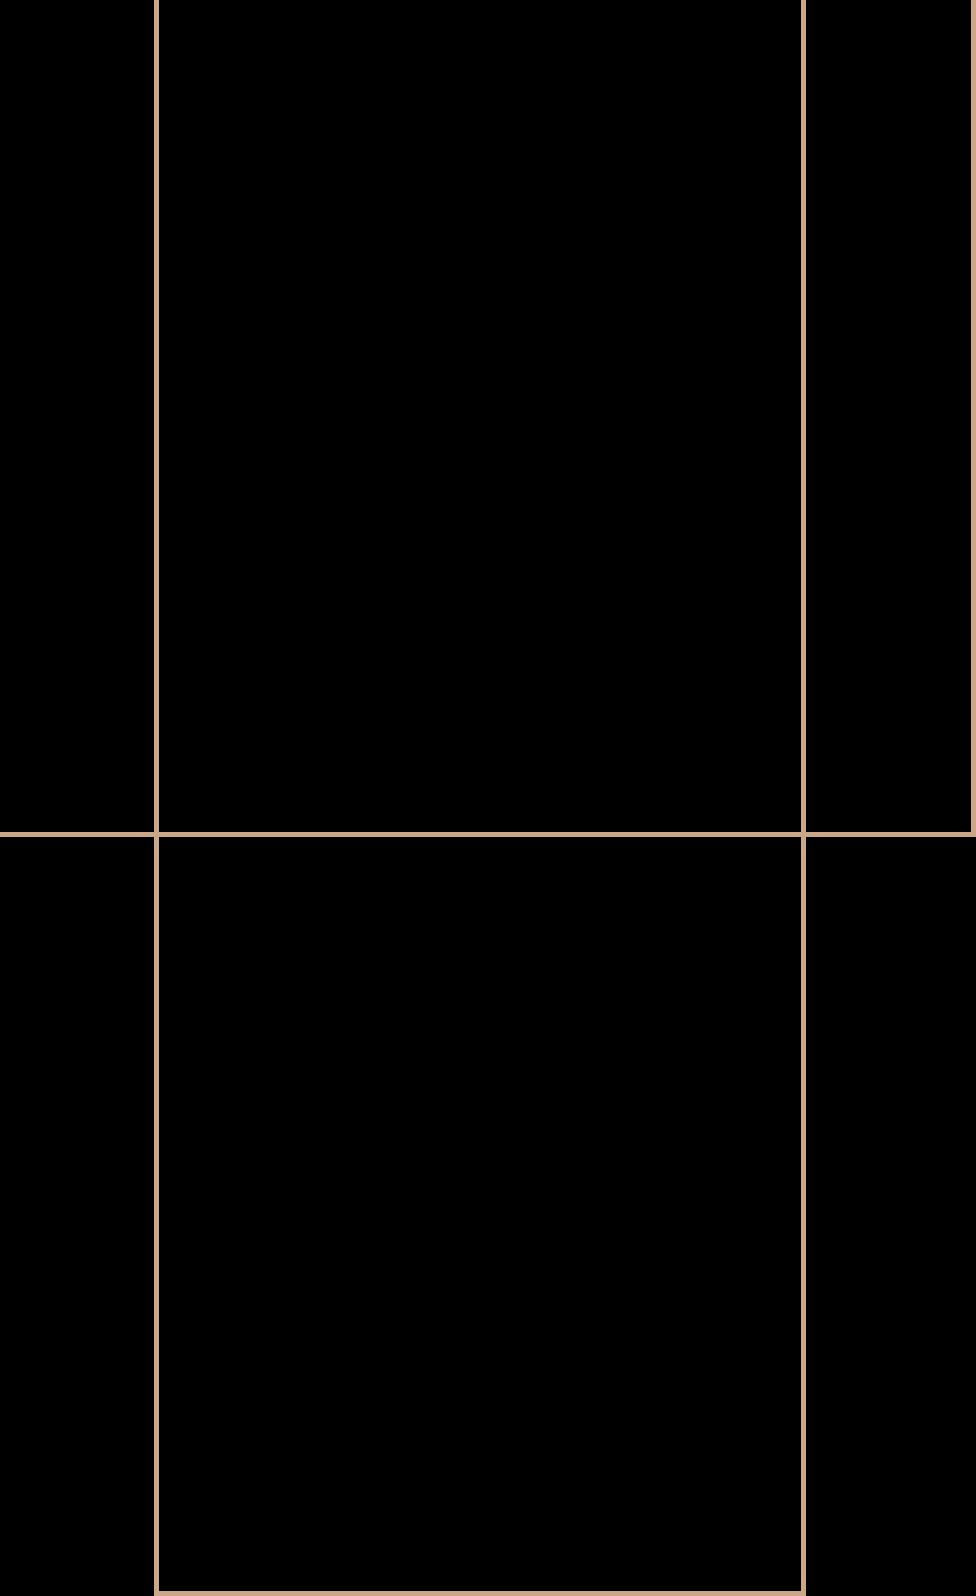 Nicco Timber Doors & Windows Overlapping Shape